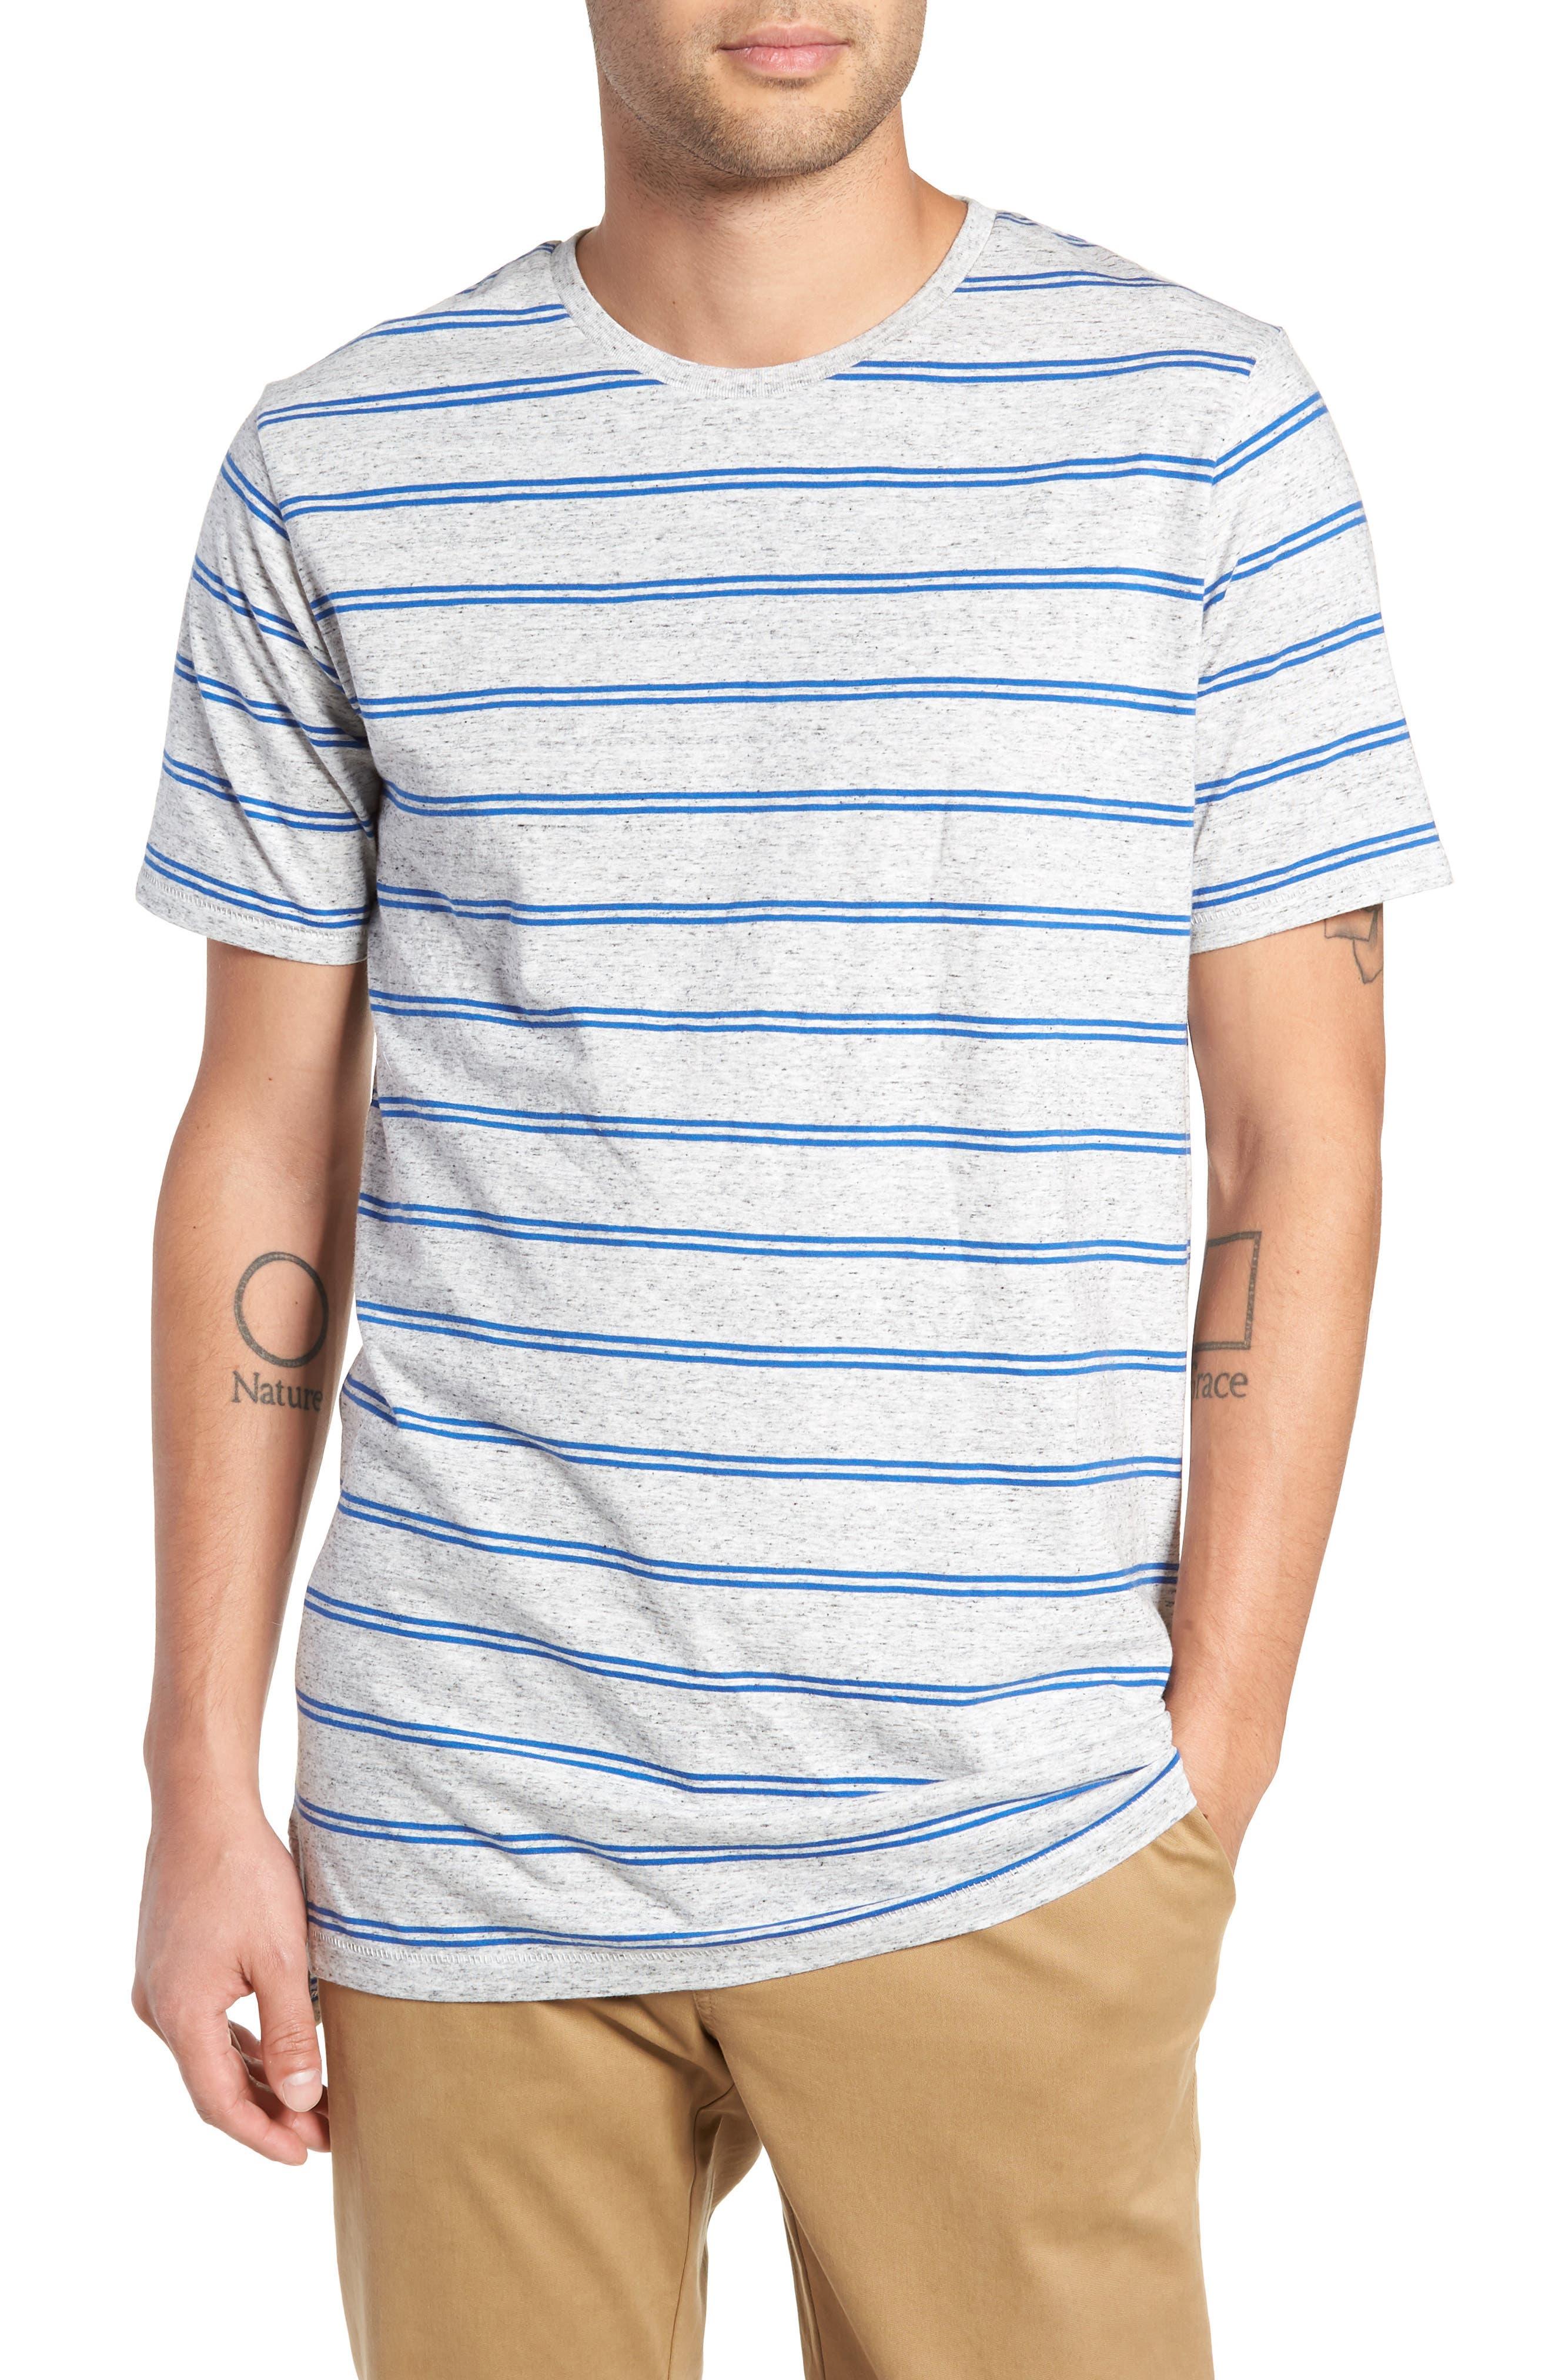 Flintlock T-Shirt,                         Main,                         color, STORM MARLE/ COBALT